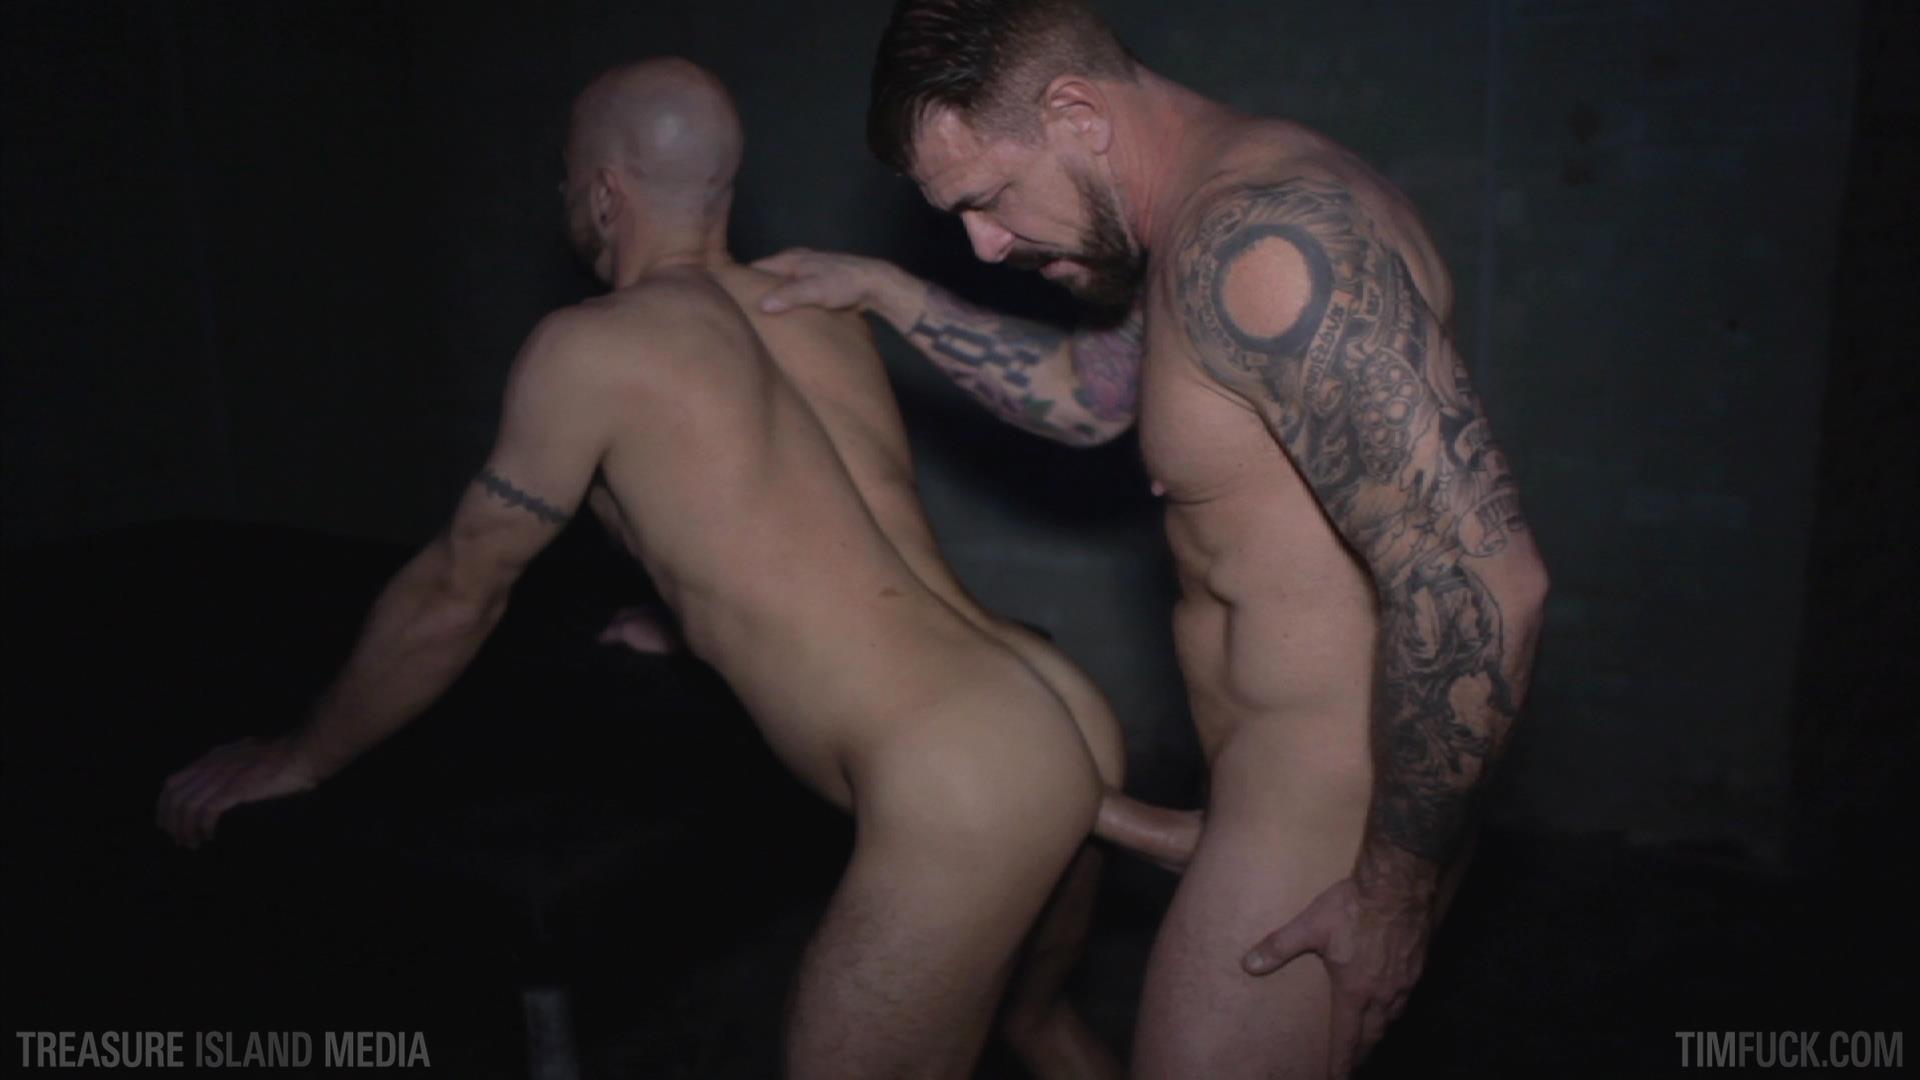 Treasure-Island-Media-TimFuck-Rocco-Steele-and-Ben-Statham-Bareback-Amateur-Gay-Porn-04 Treasure Island Media: Rocco Steele and Ben Statham Bareback In A London Bathhouse